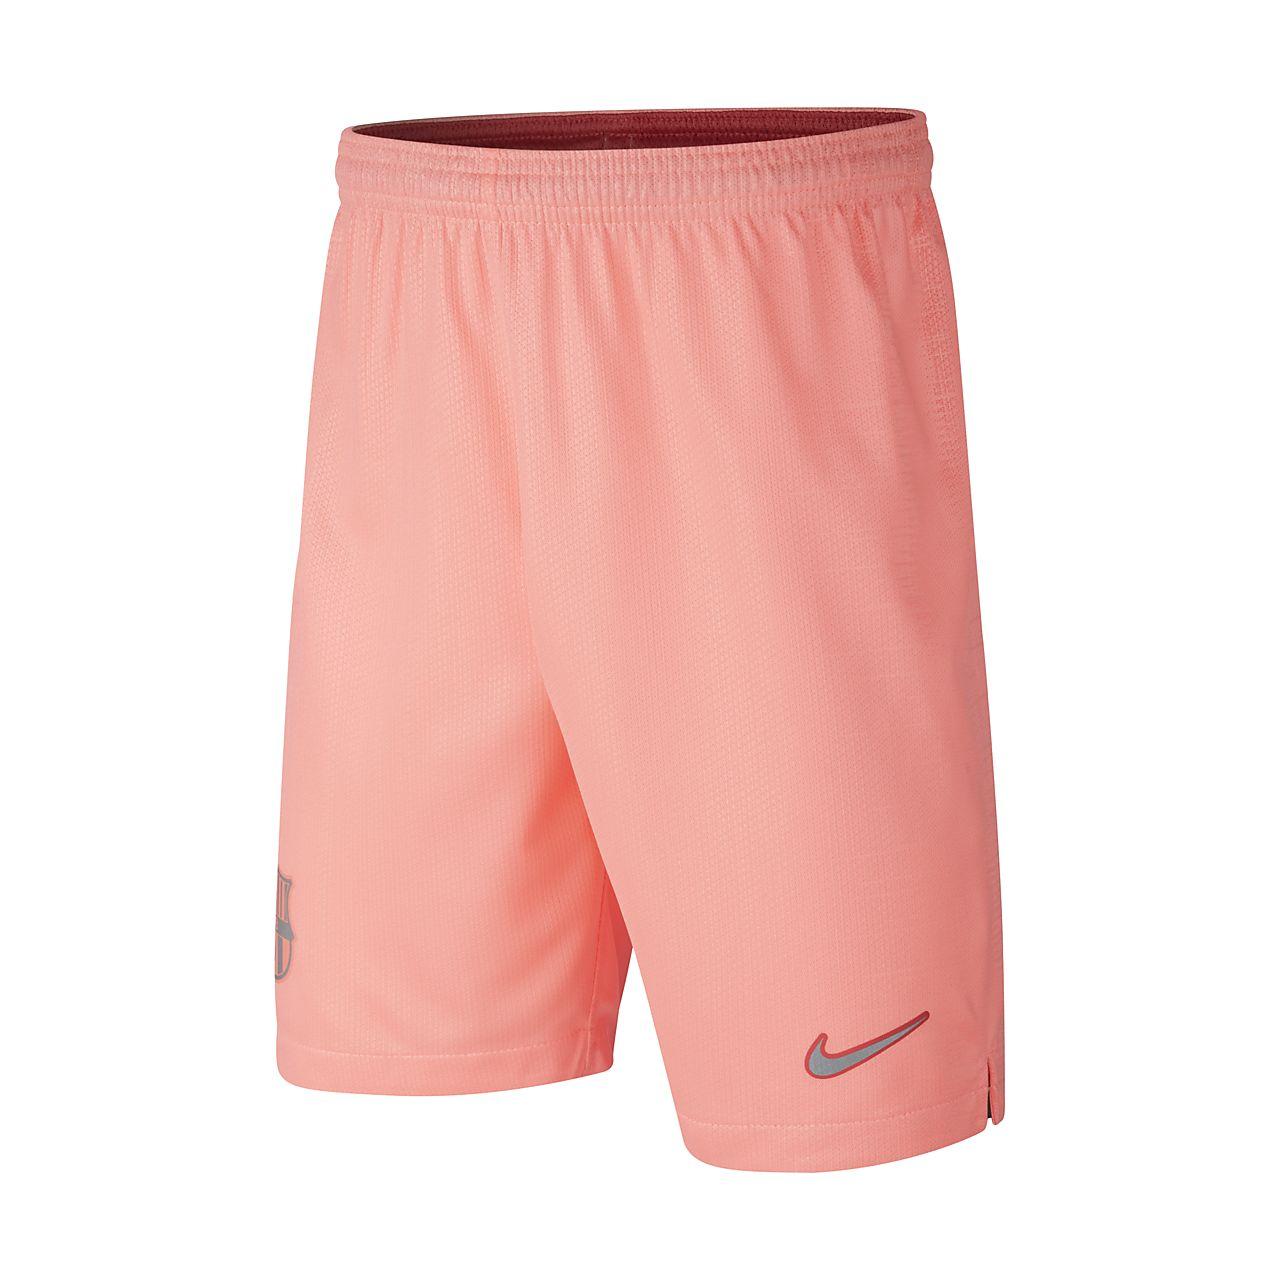 989cbae1d03 2018/19 FC Barcelona Stadium Third Older Kids' Football Shorts. Nike ...